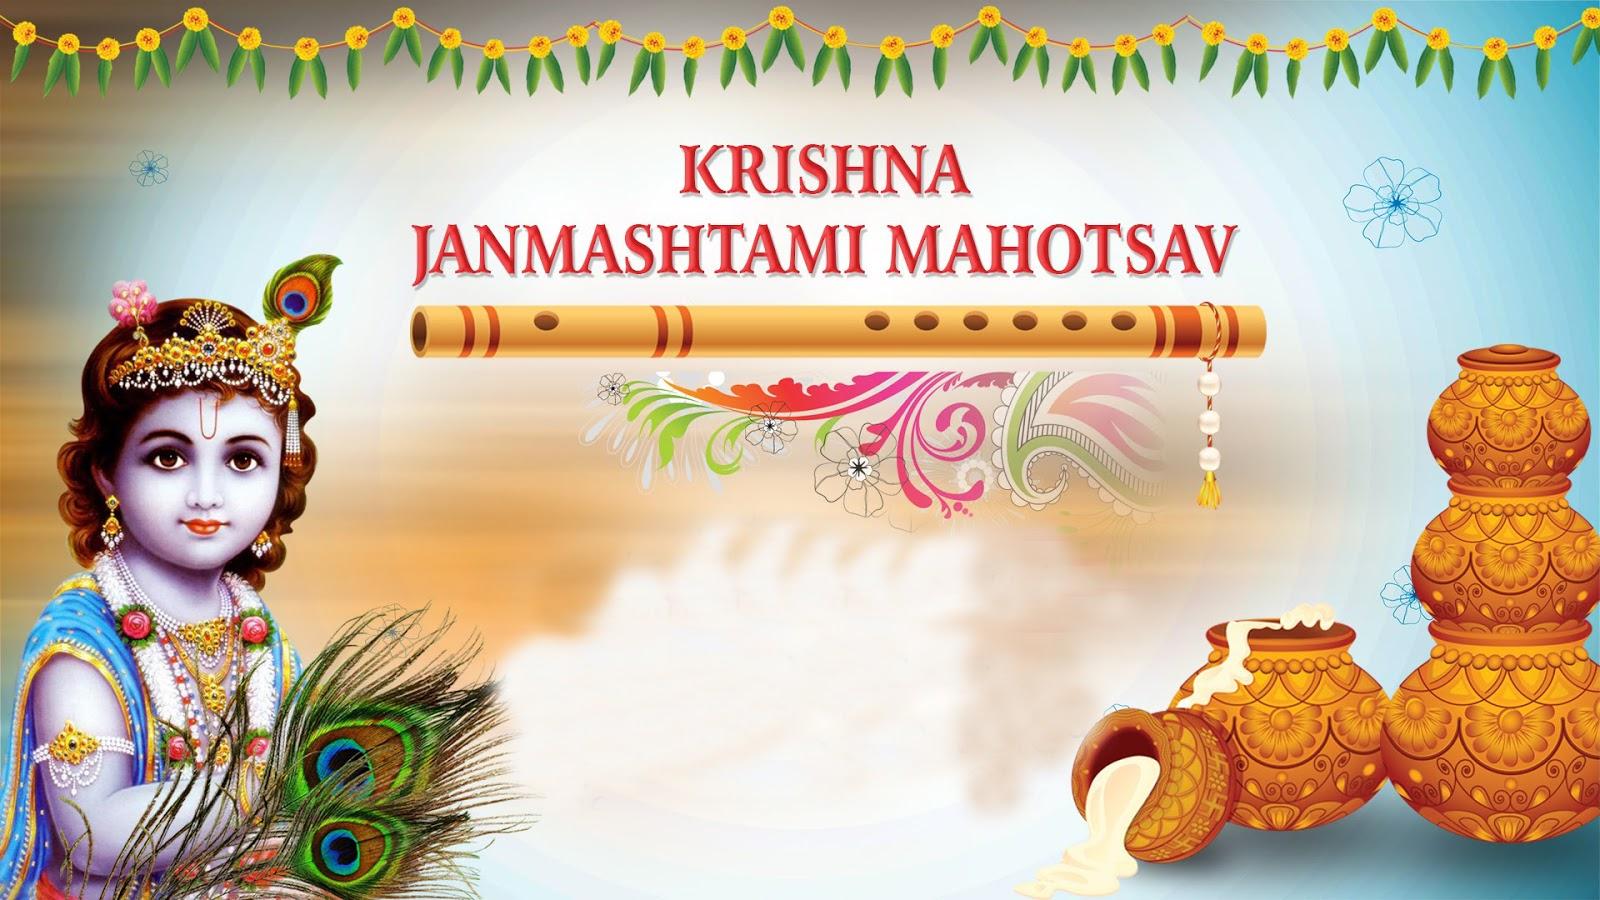 Happy Krishna Janmashtami Wishes Images for WhatsApp